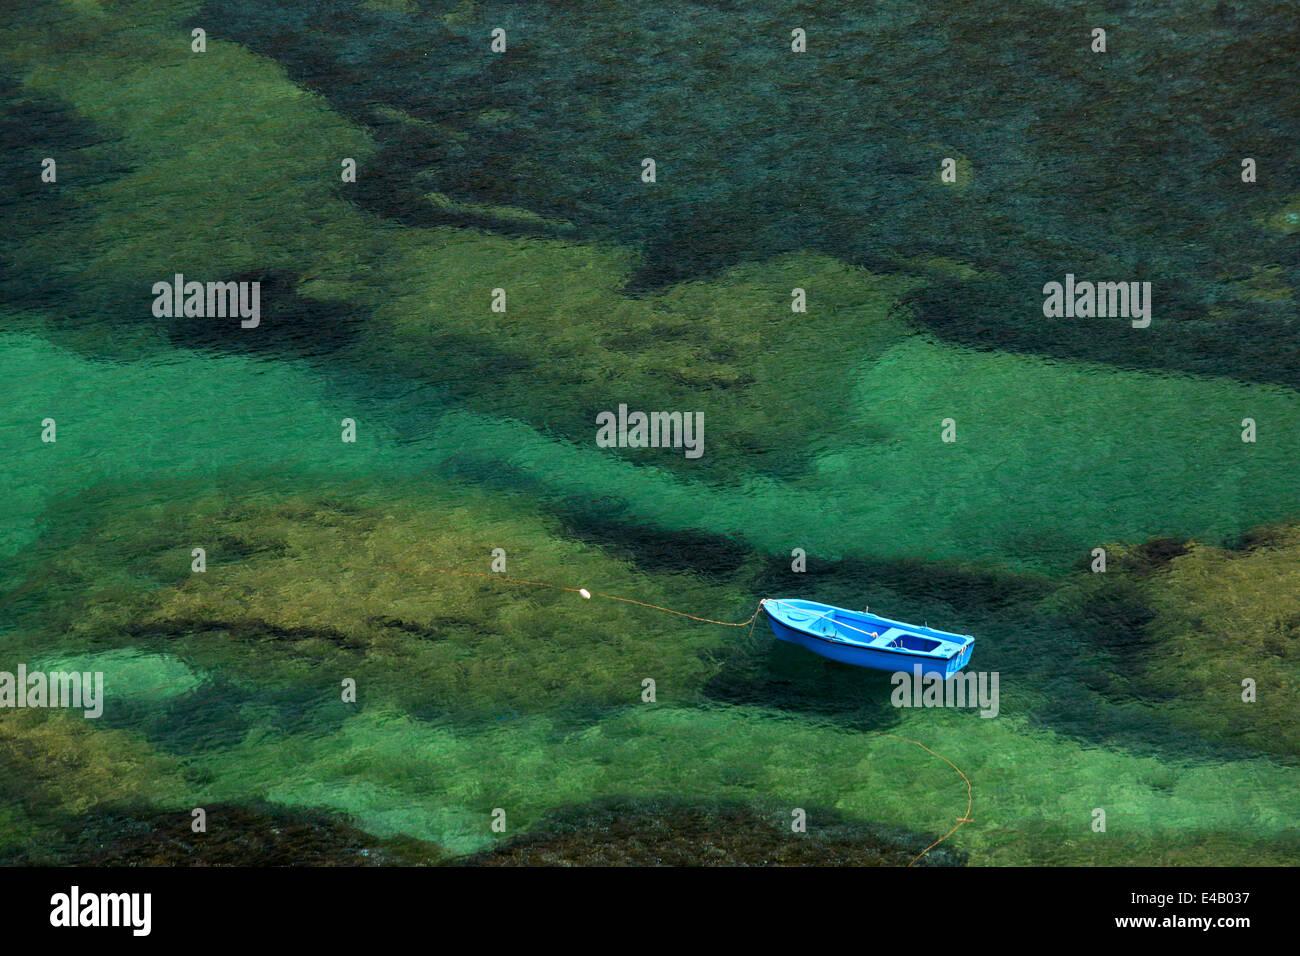 'Lonely' boat close to Emboreios village (Alexis beach), Kalymnos island, Dodecanese, Aegean sea, Greece - Stock Image